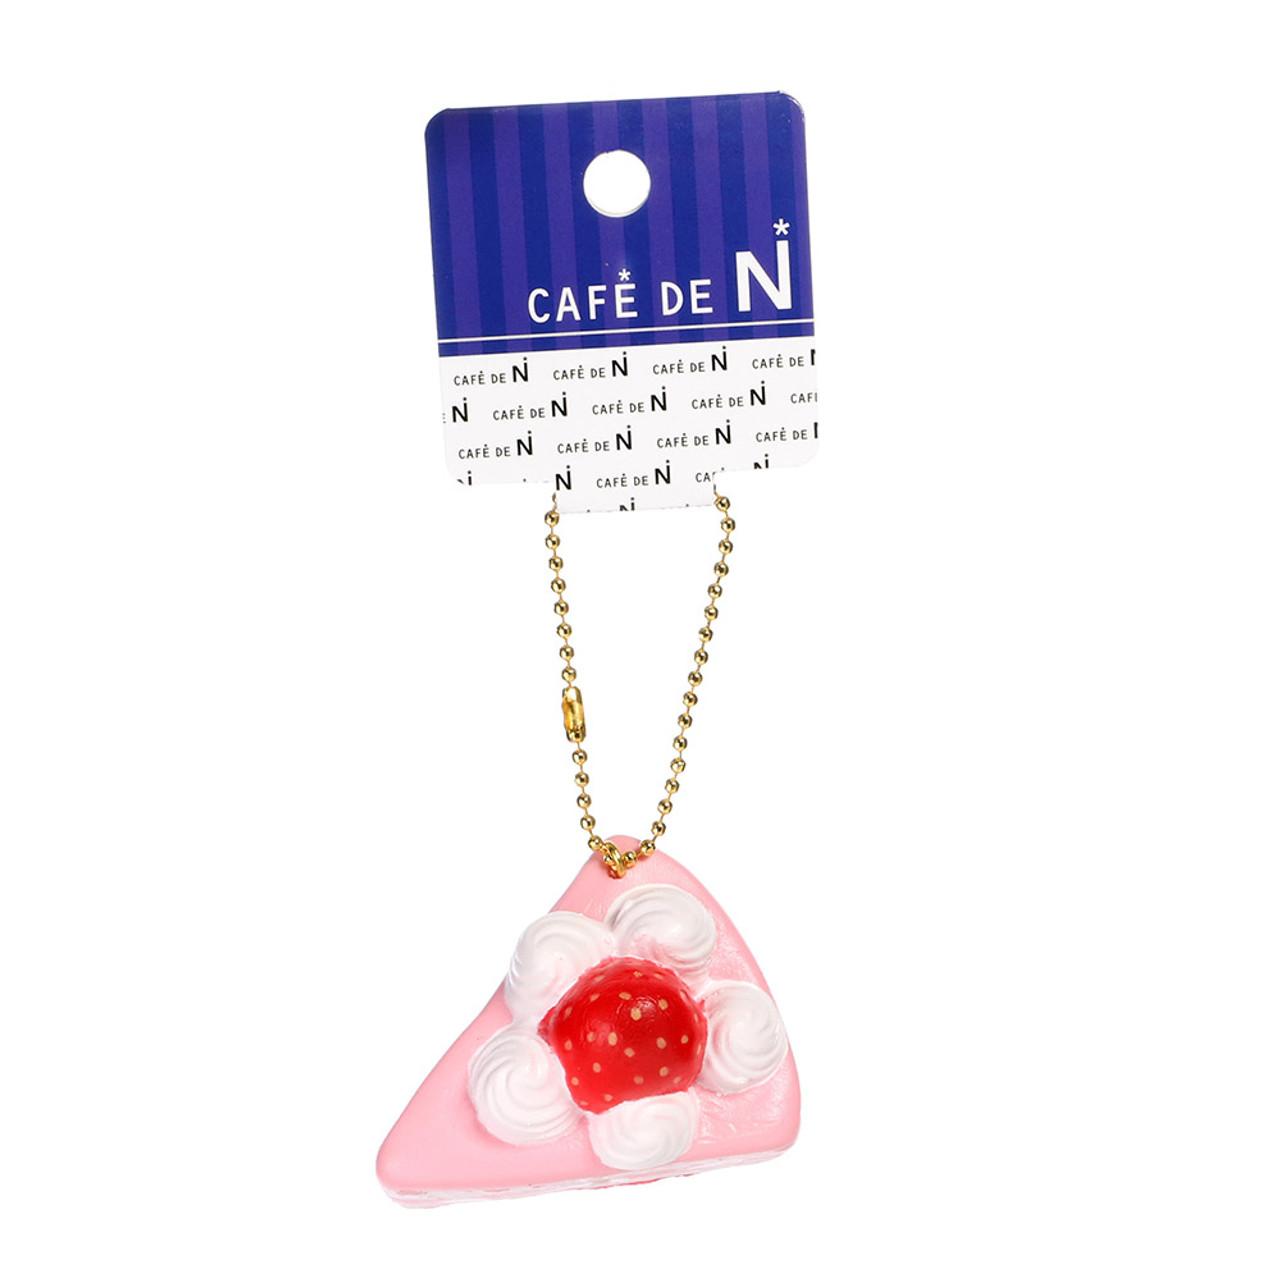 Café De N Soft Squishy Cellphone Charms - Strawberry Fruit Pulp with Cream Shortcake ( Tag View )